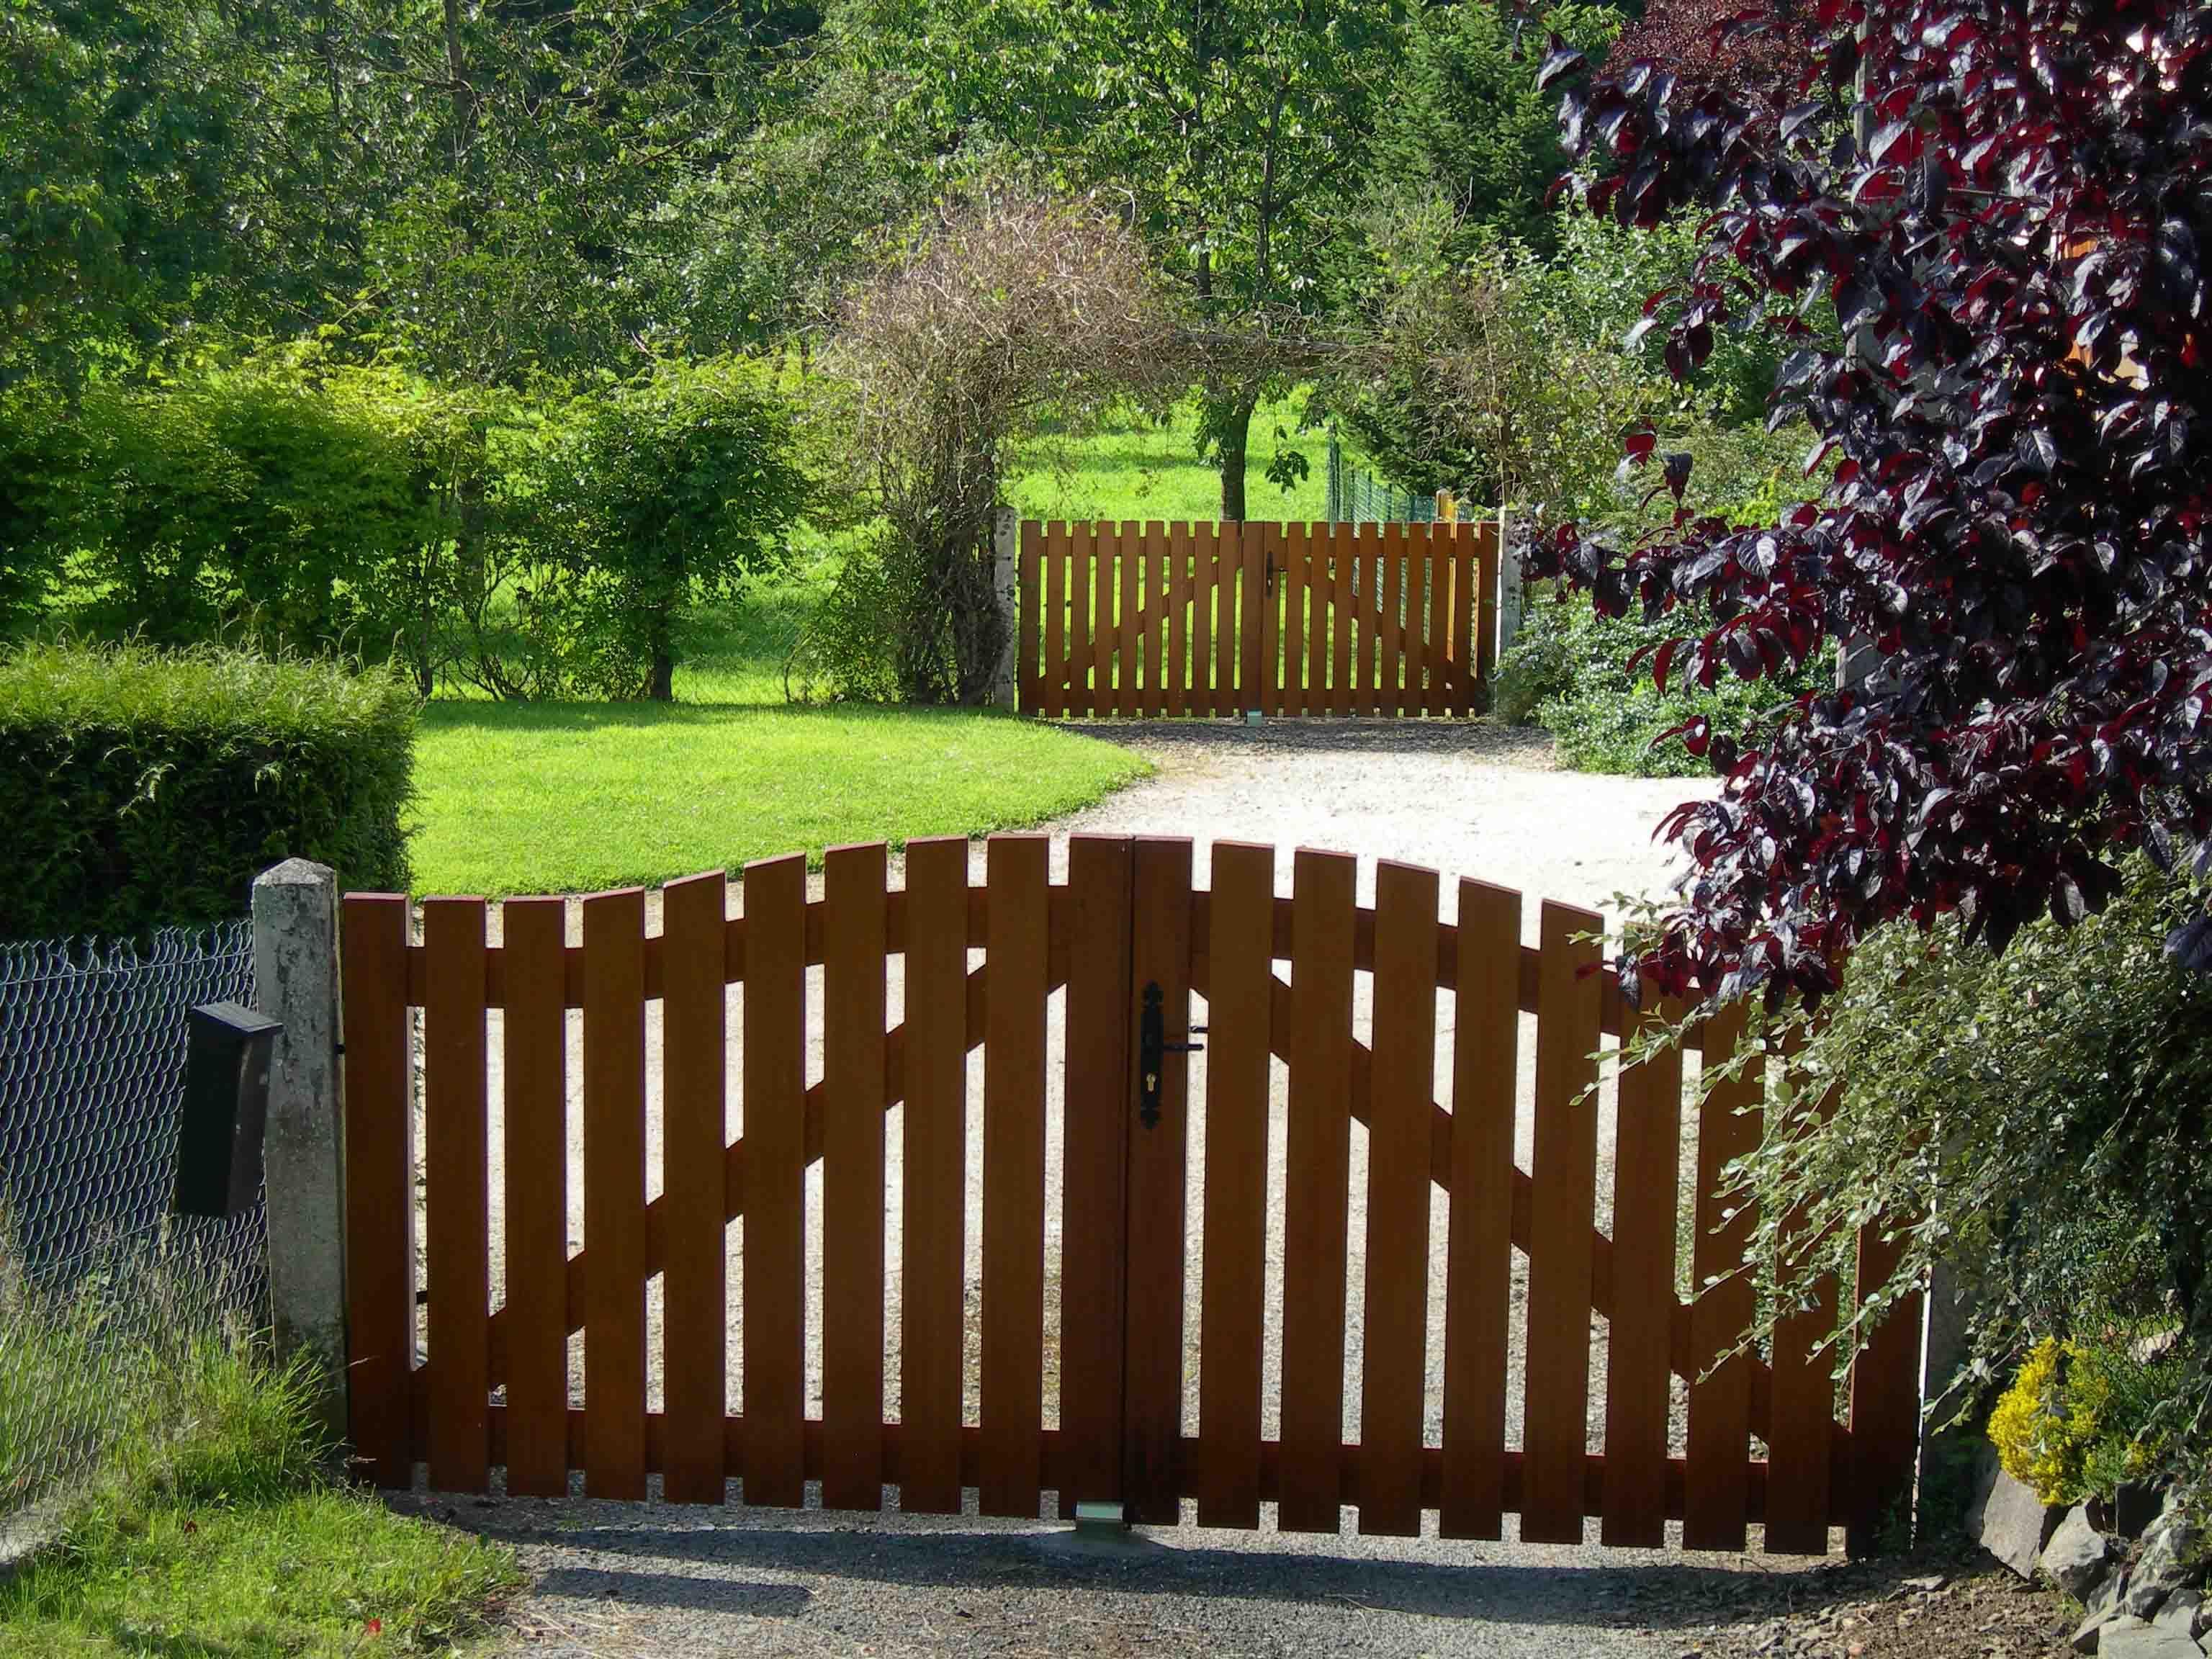 Simple Wooden Gates In A Beautiful Normandy Garden Gardens